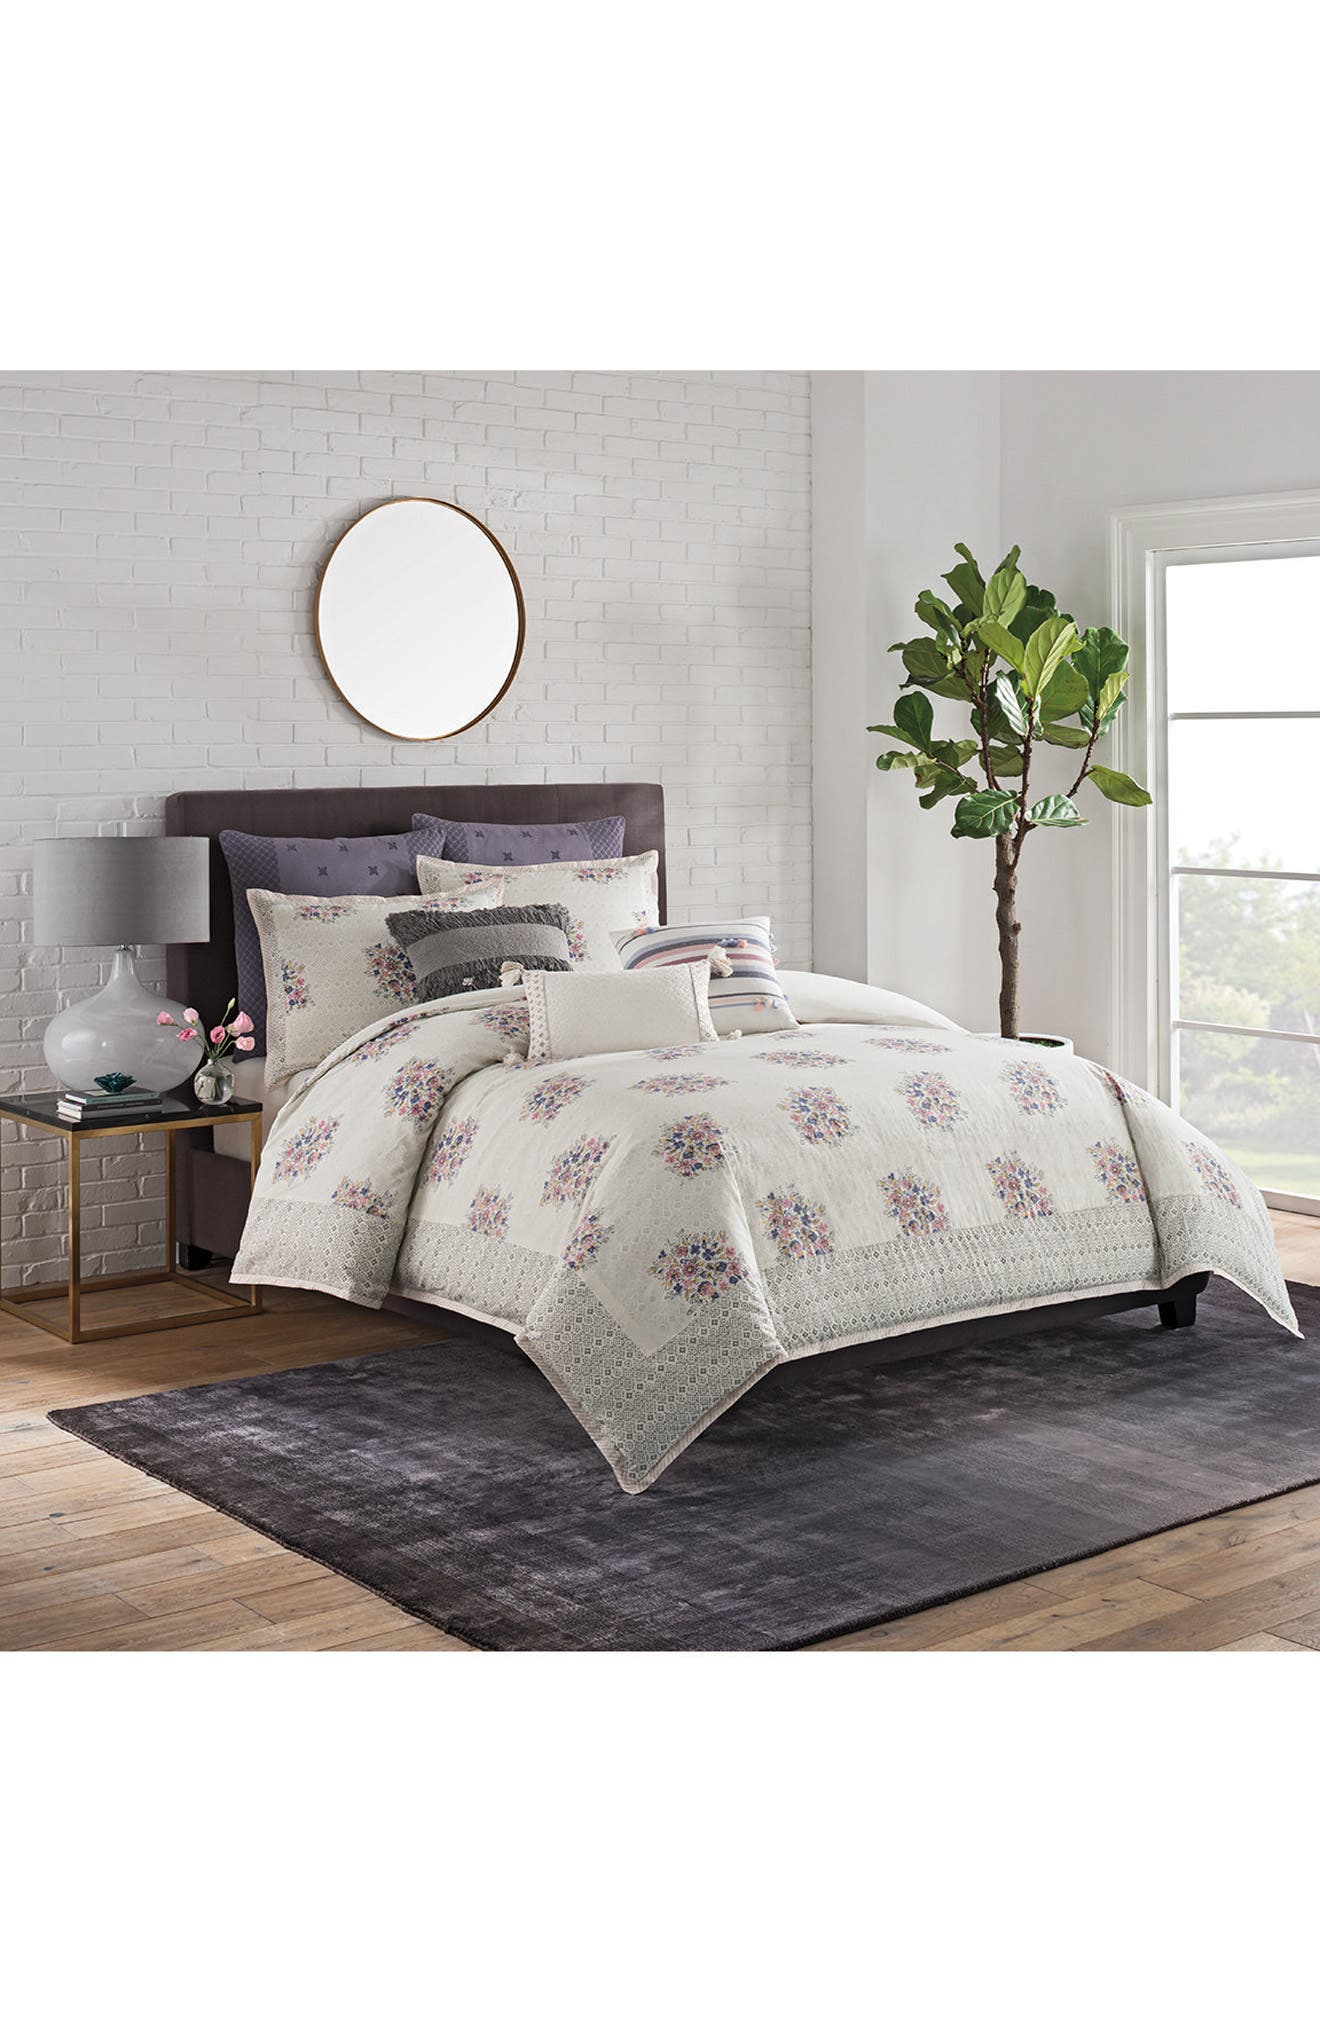 Tassel Stripe Accent Pillow,                             Alternate thumbnail 3, color,                             Purple Multi